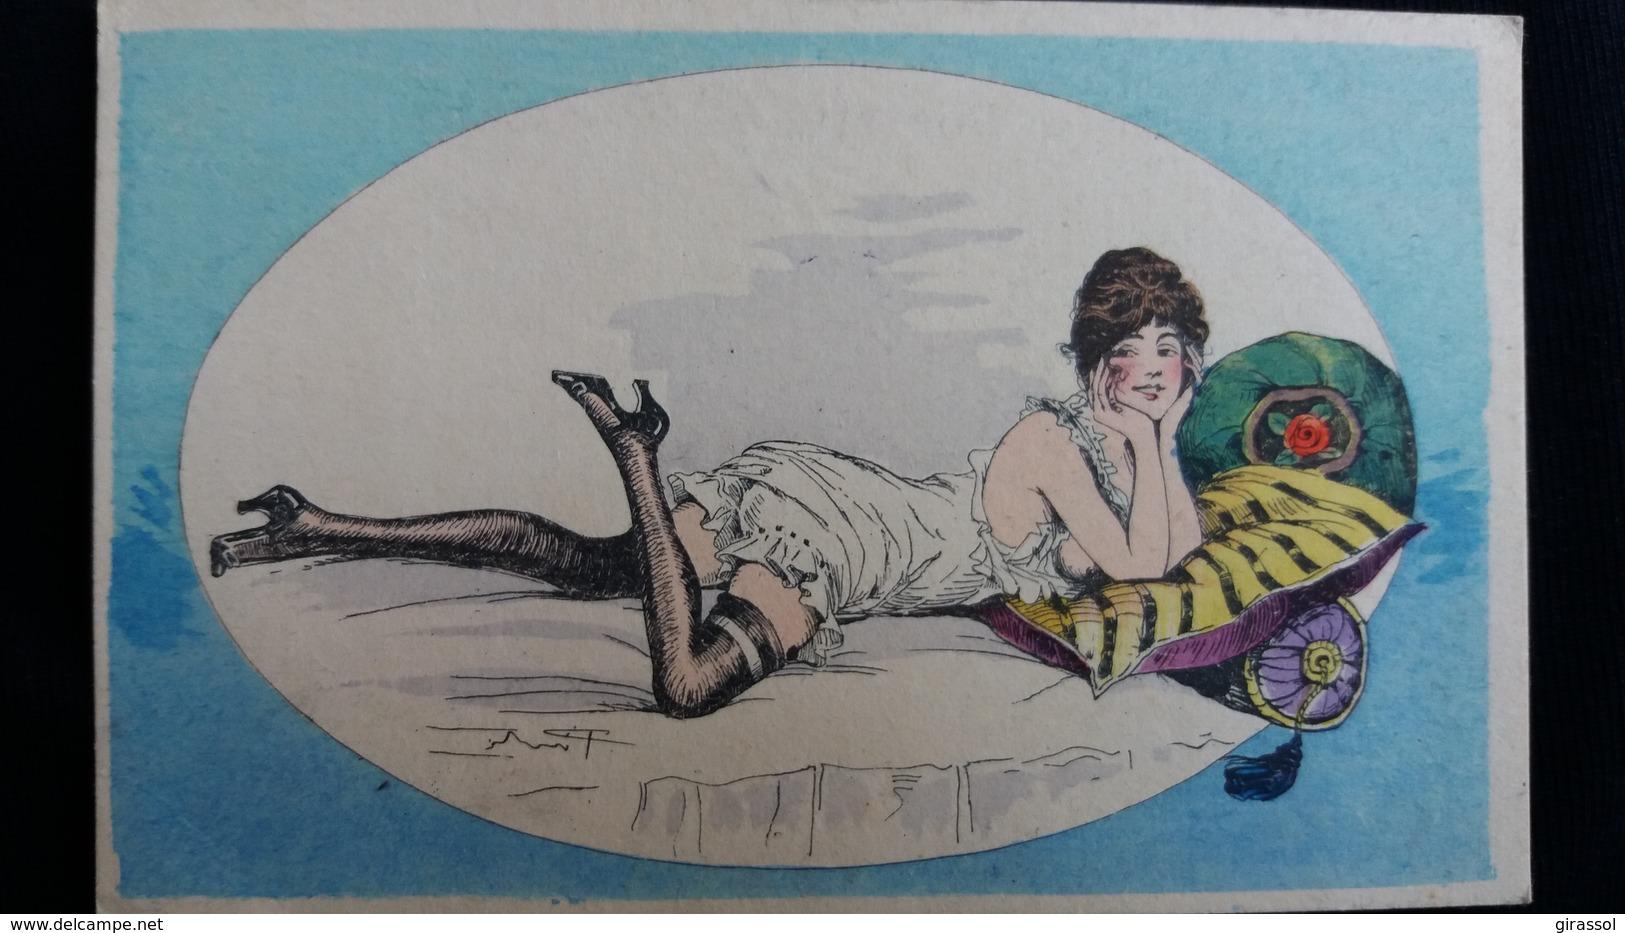 CPA ILLUSTRATEUR PINTI SERIE DOLCE FARNIENTE N° 30 FEMME SEINS NUE COQUINE COUSSINS BAS NOIRS - Illustrateurs & Photographes